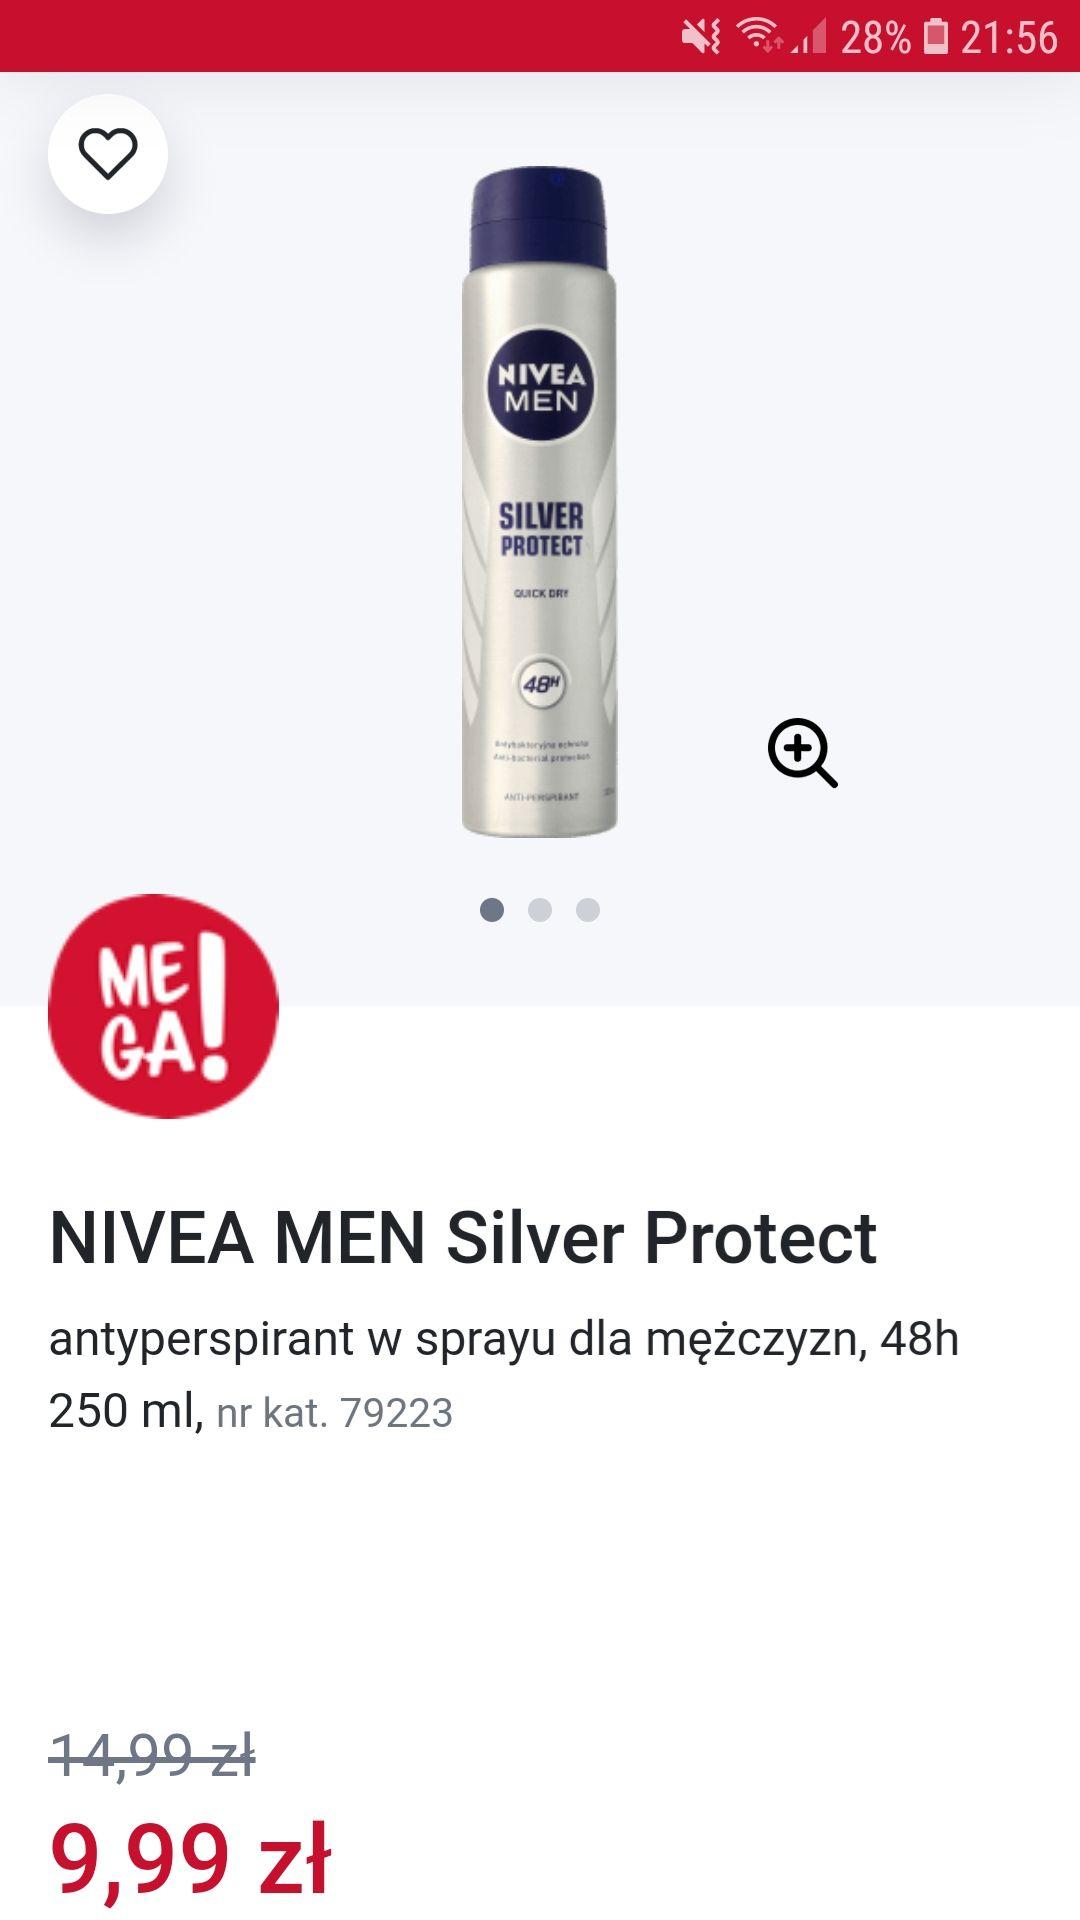 Antyperspirant Nivea Silver protect 250ml.